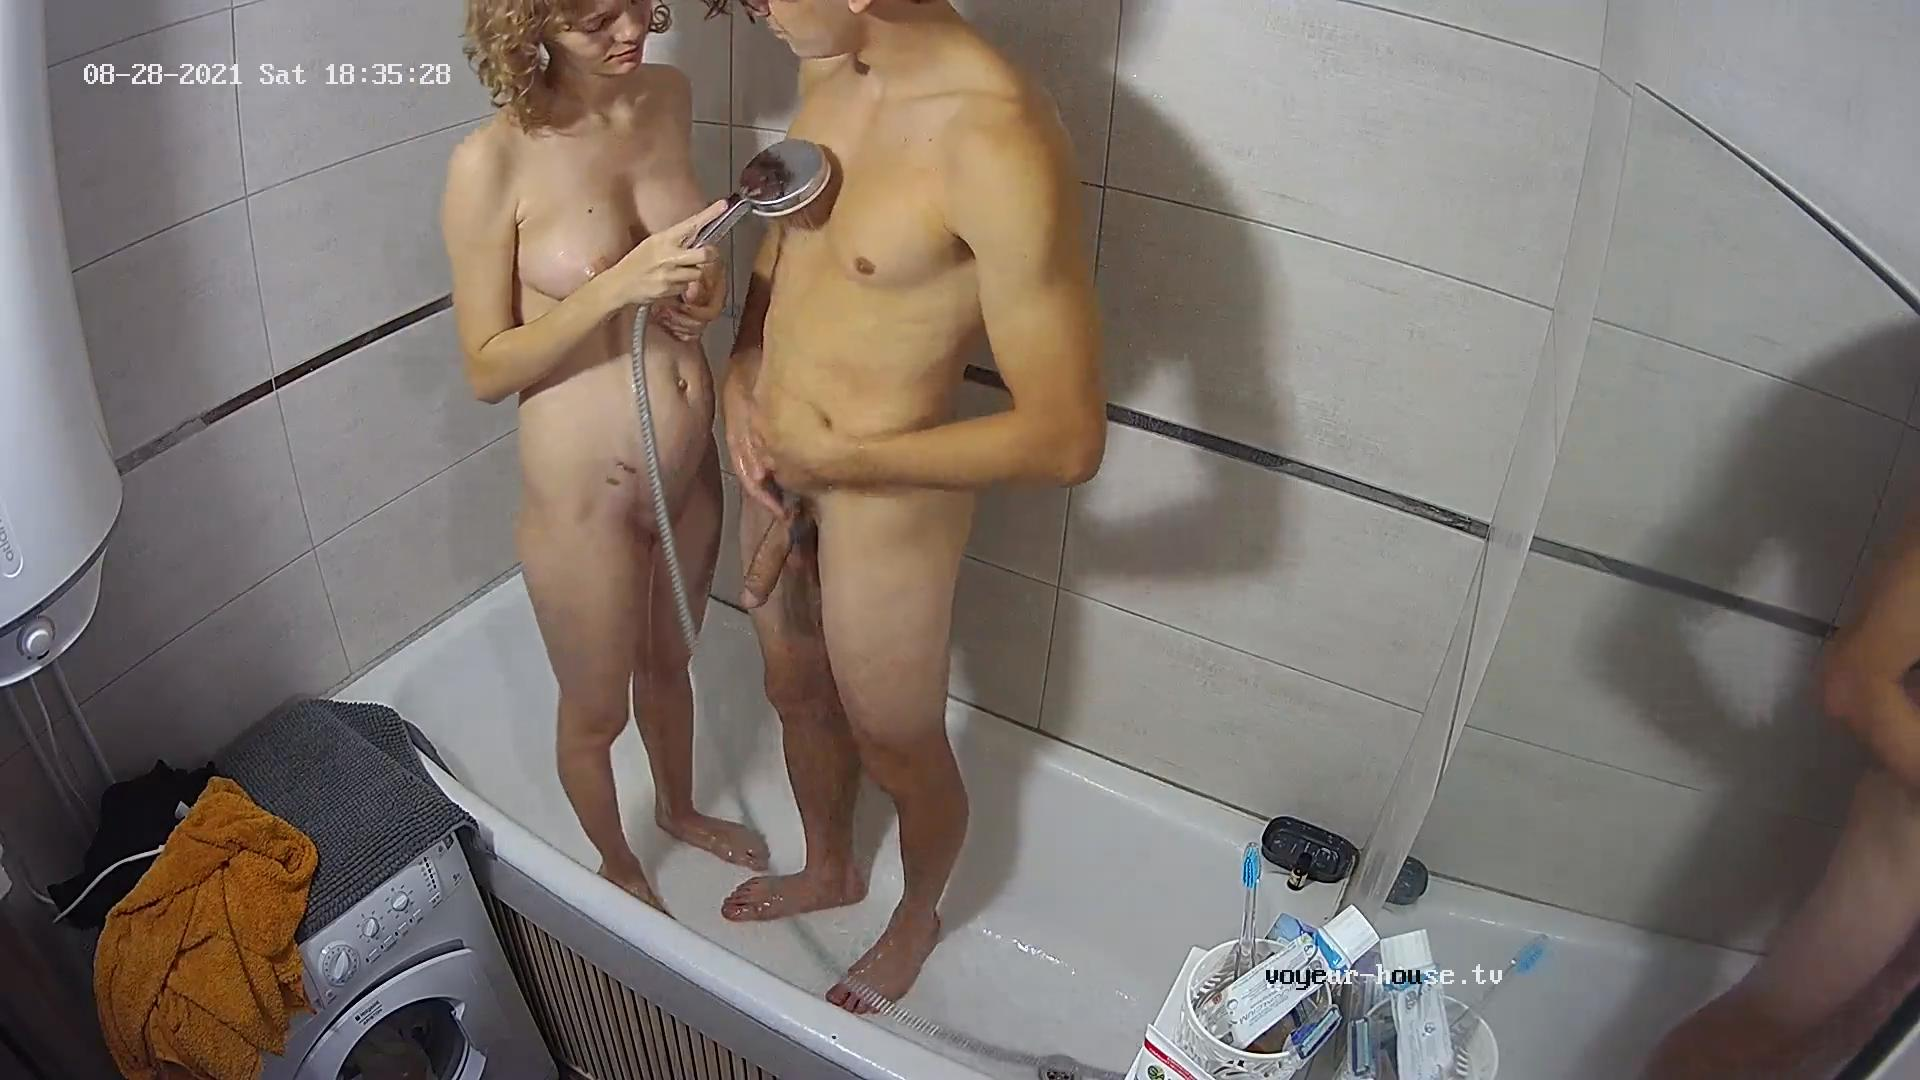 Mars Jessi shower 28 Aug 2021